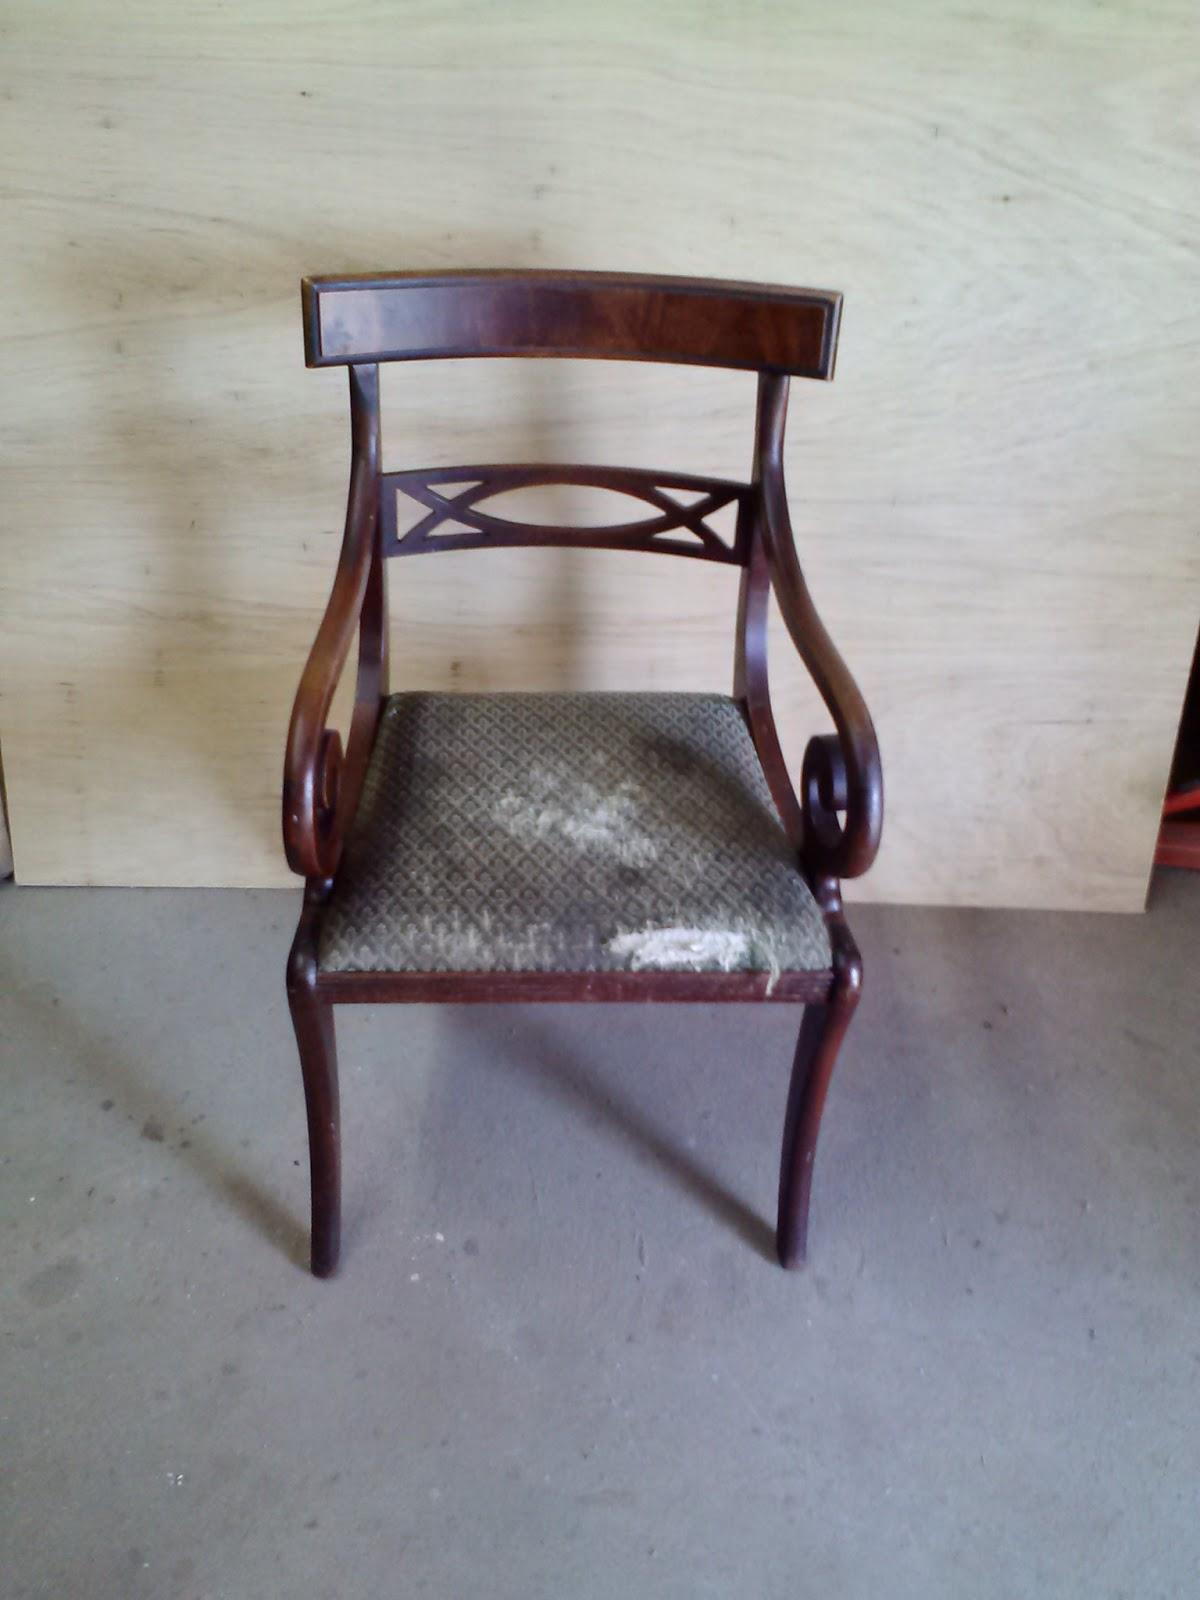 Frontier Furniture Repair And Restoration: American Empire